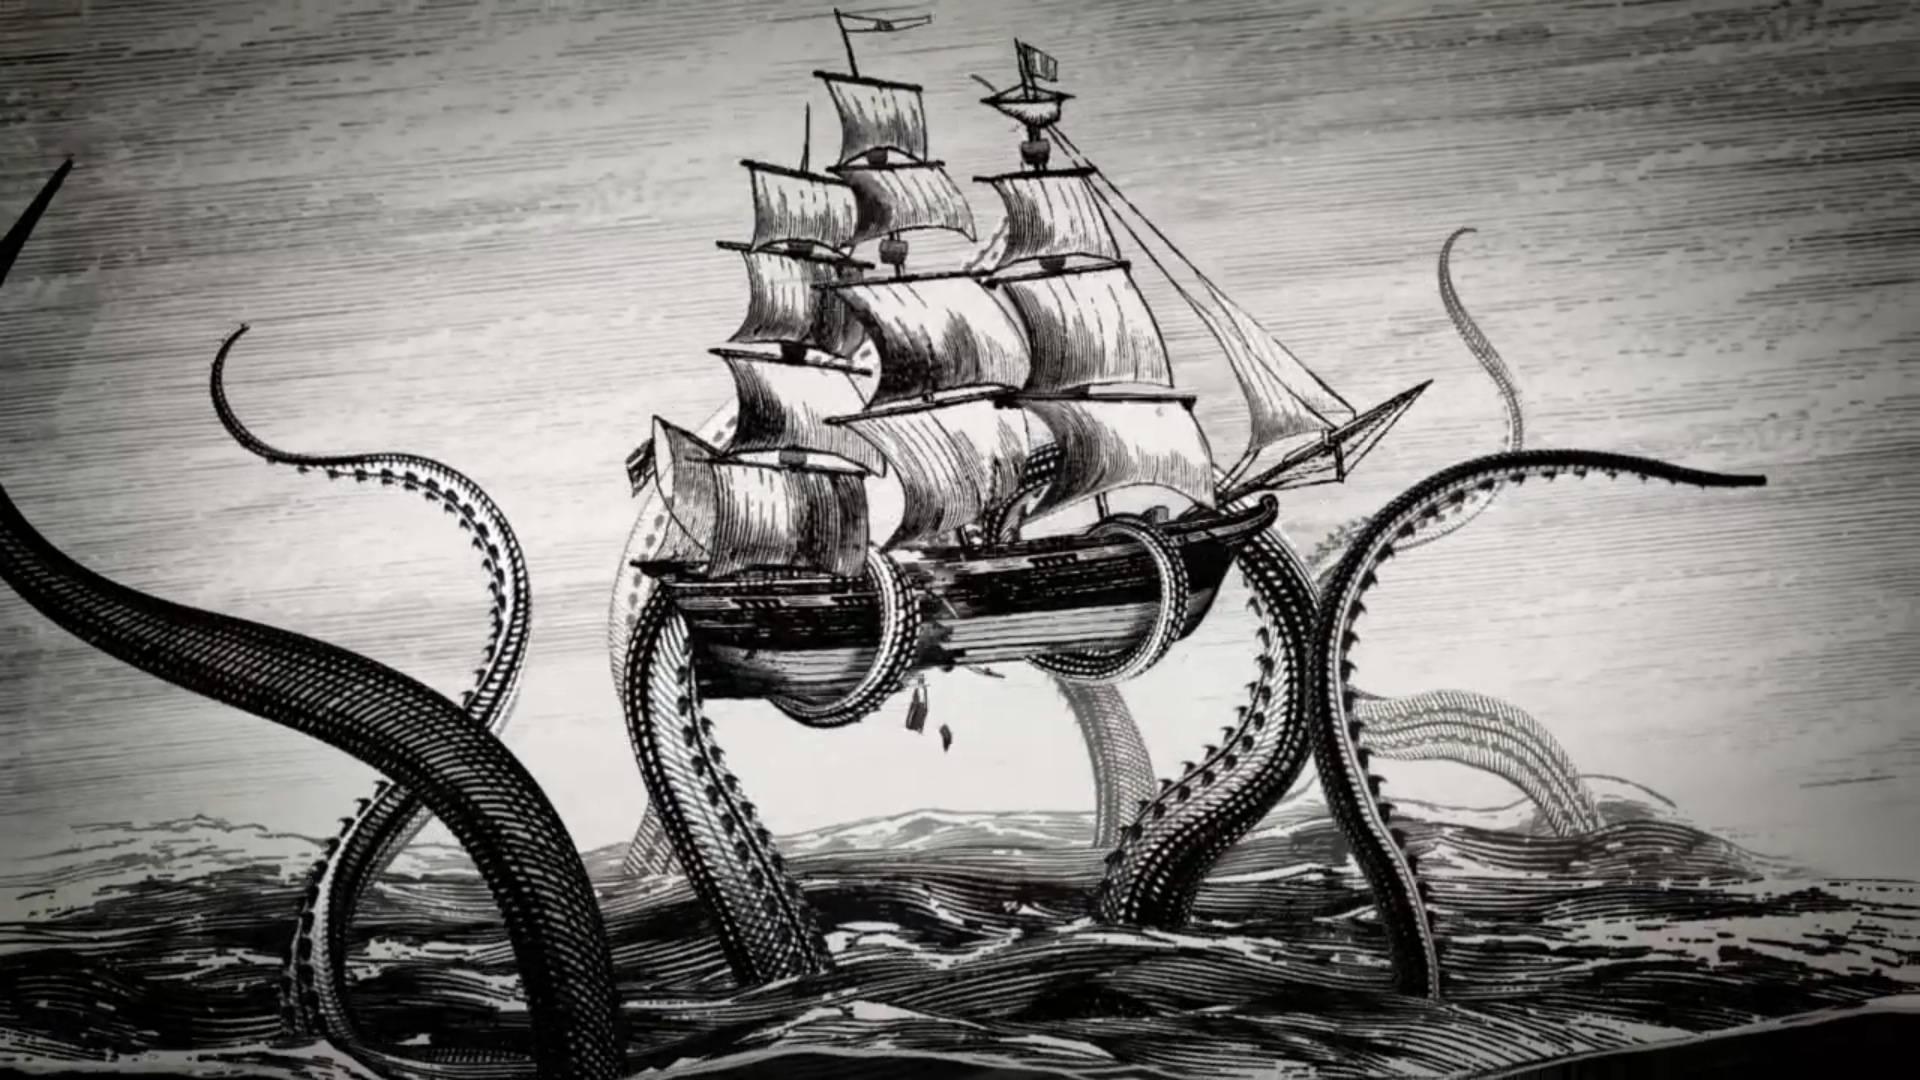 Vintage Kraken Illustration kraken-illustration